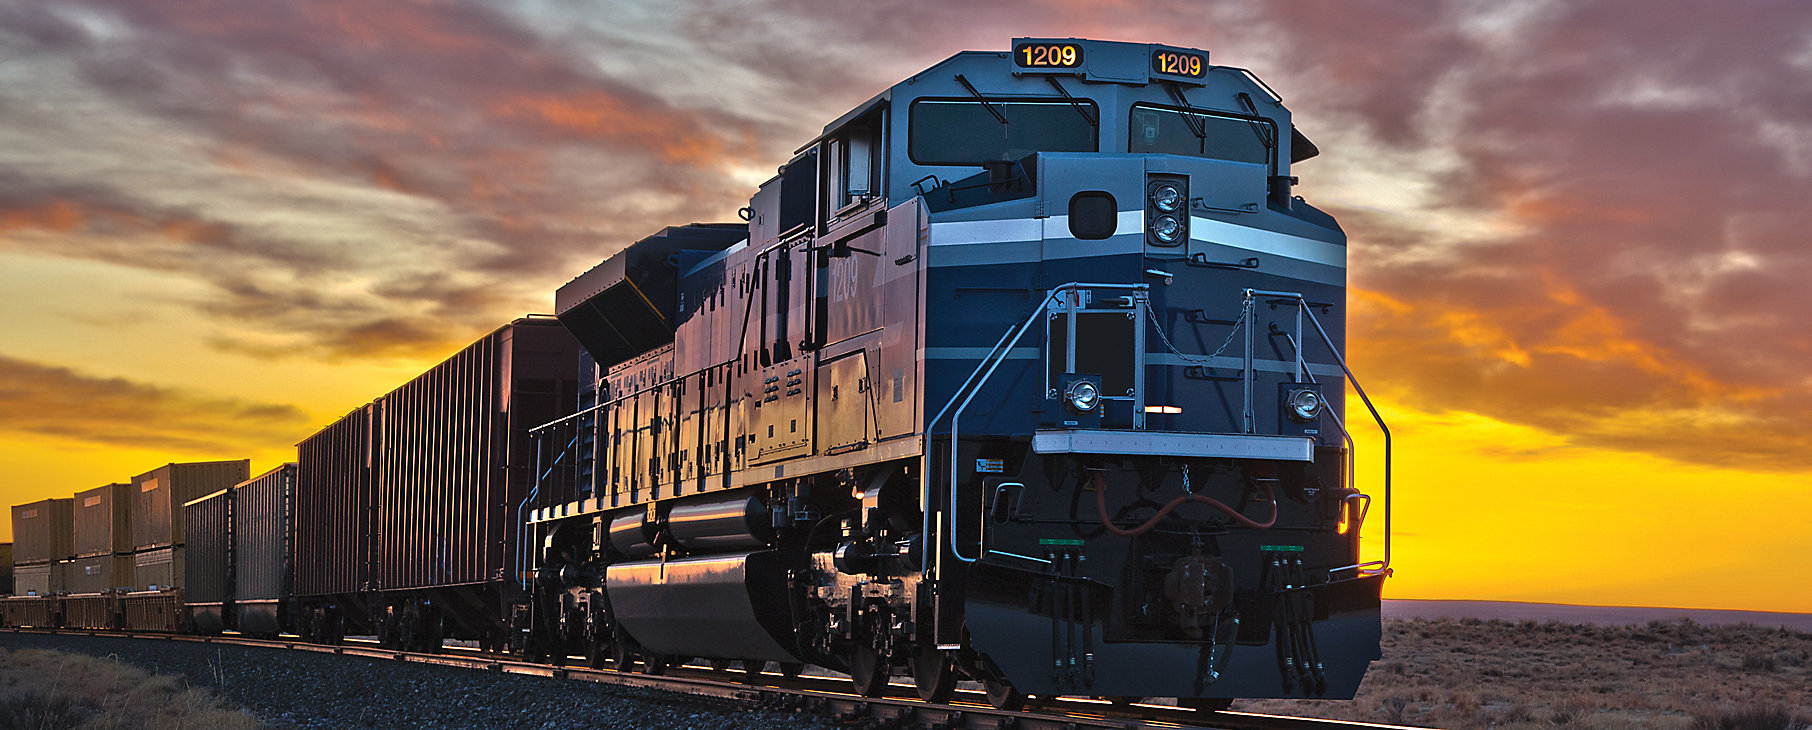 EMD® Locomotives, EMD